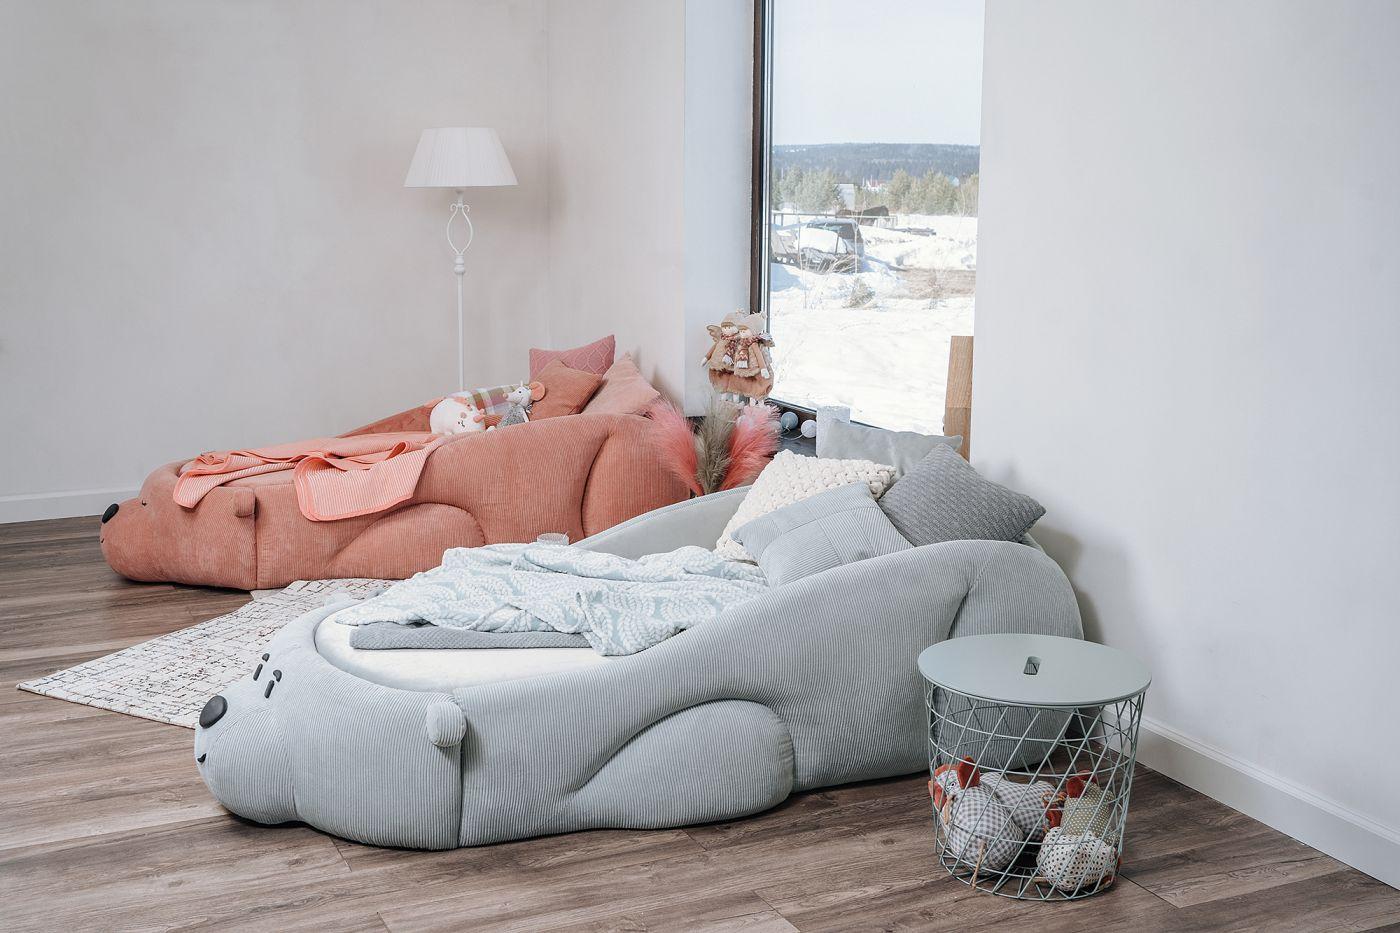 Кровать-зверюшка Romack Мишка